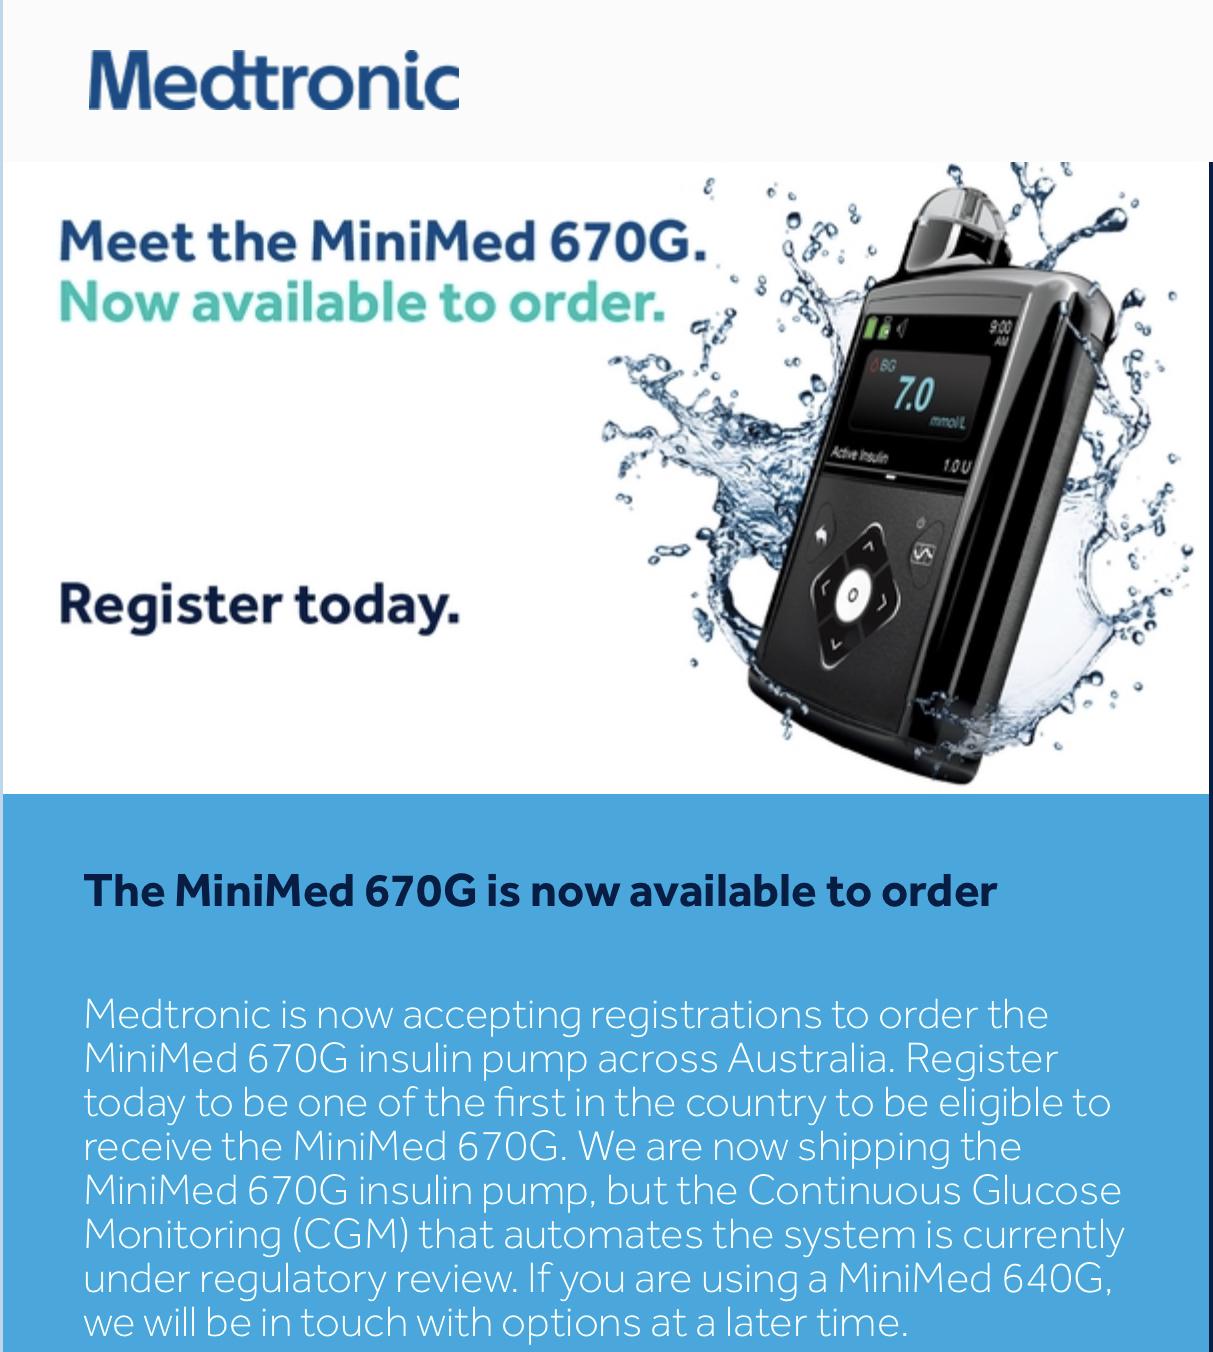 Medtronic 670g Being Released in Australia | Diabetes Forum